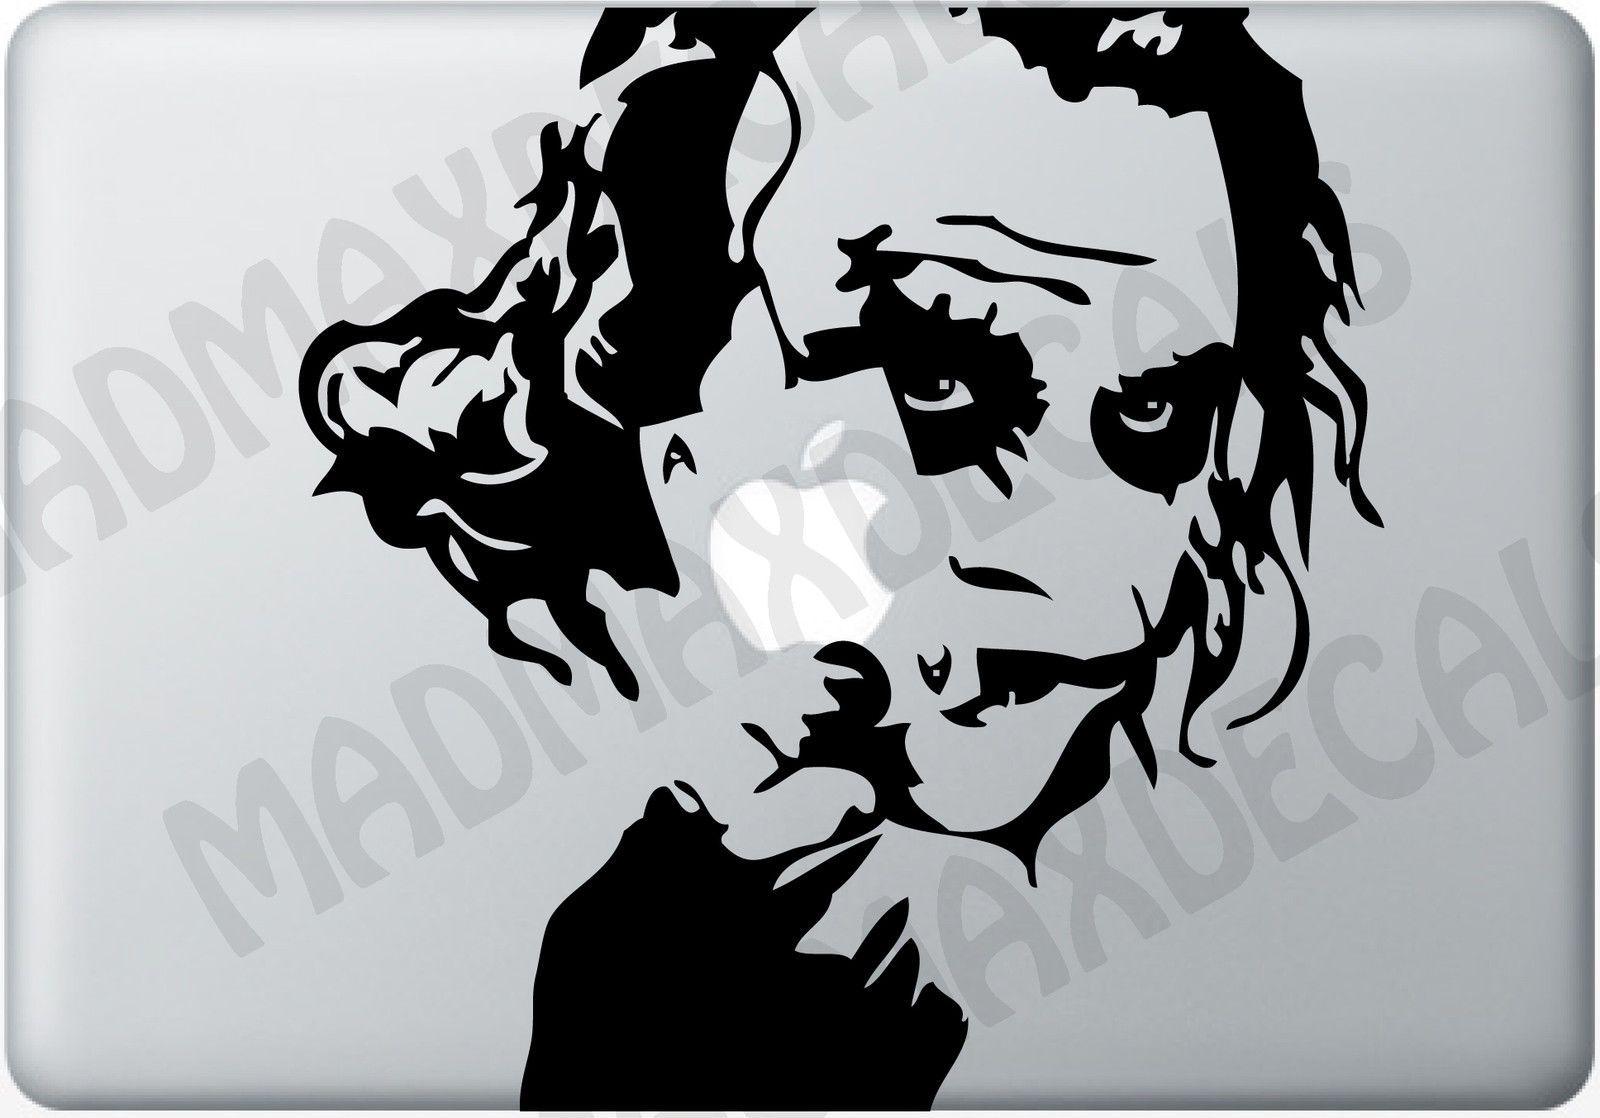 Joker Macbook Decal Vinyl Laptop Auto Sticker Heath Ledger Dark Knight Batman 8 87 Macbook Decal Joker Sketch Apple Macbook [ 1118 x 1600 Pixel ]